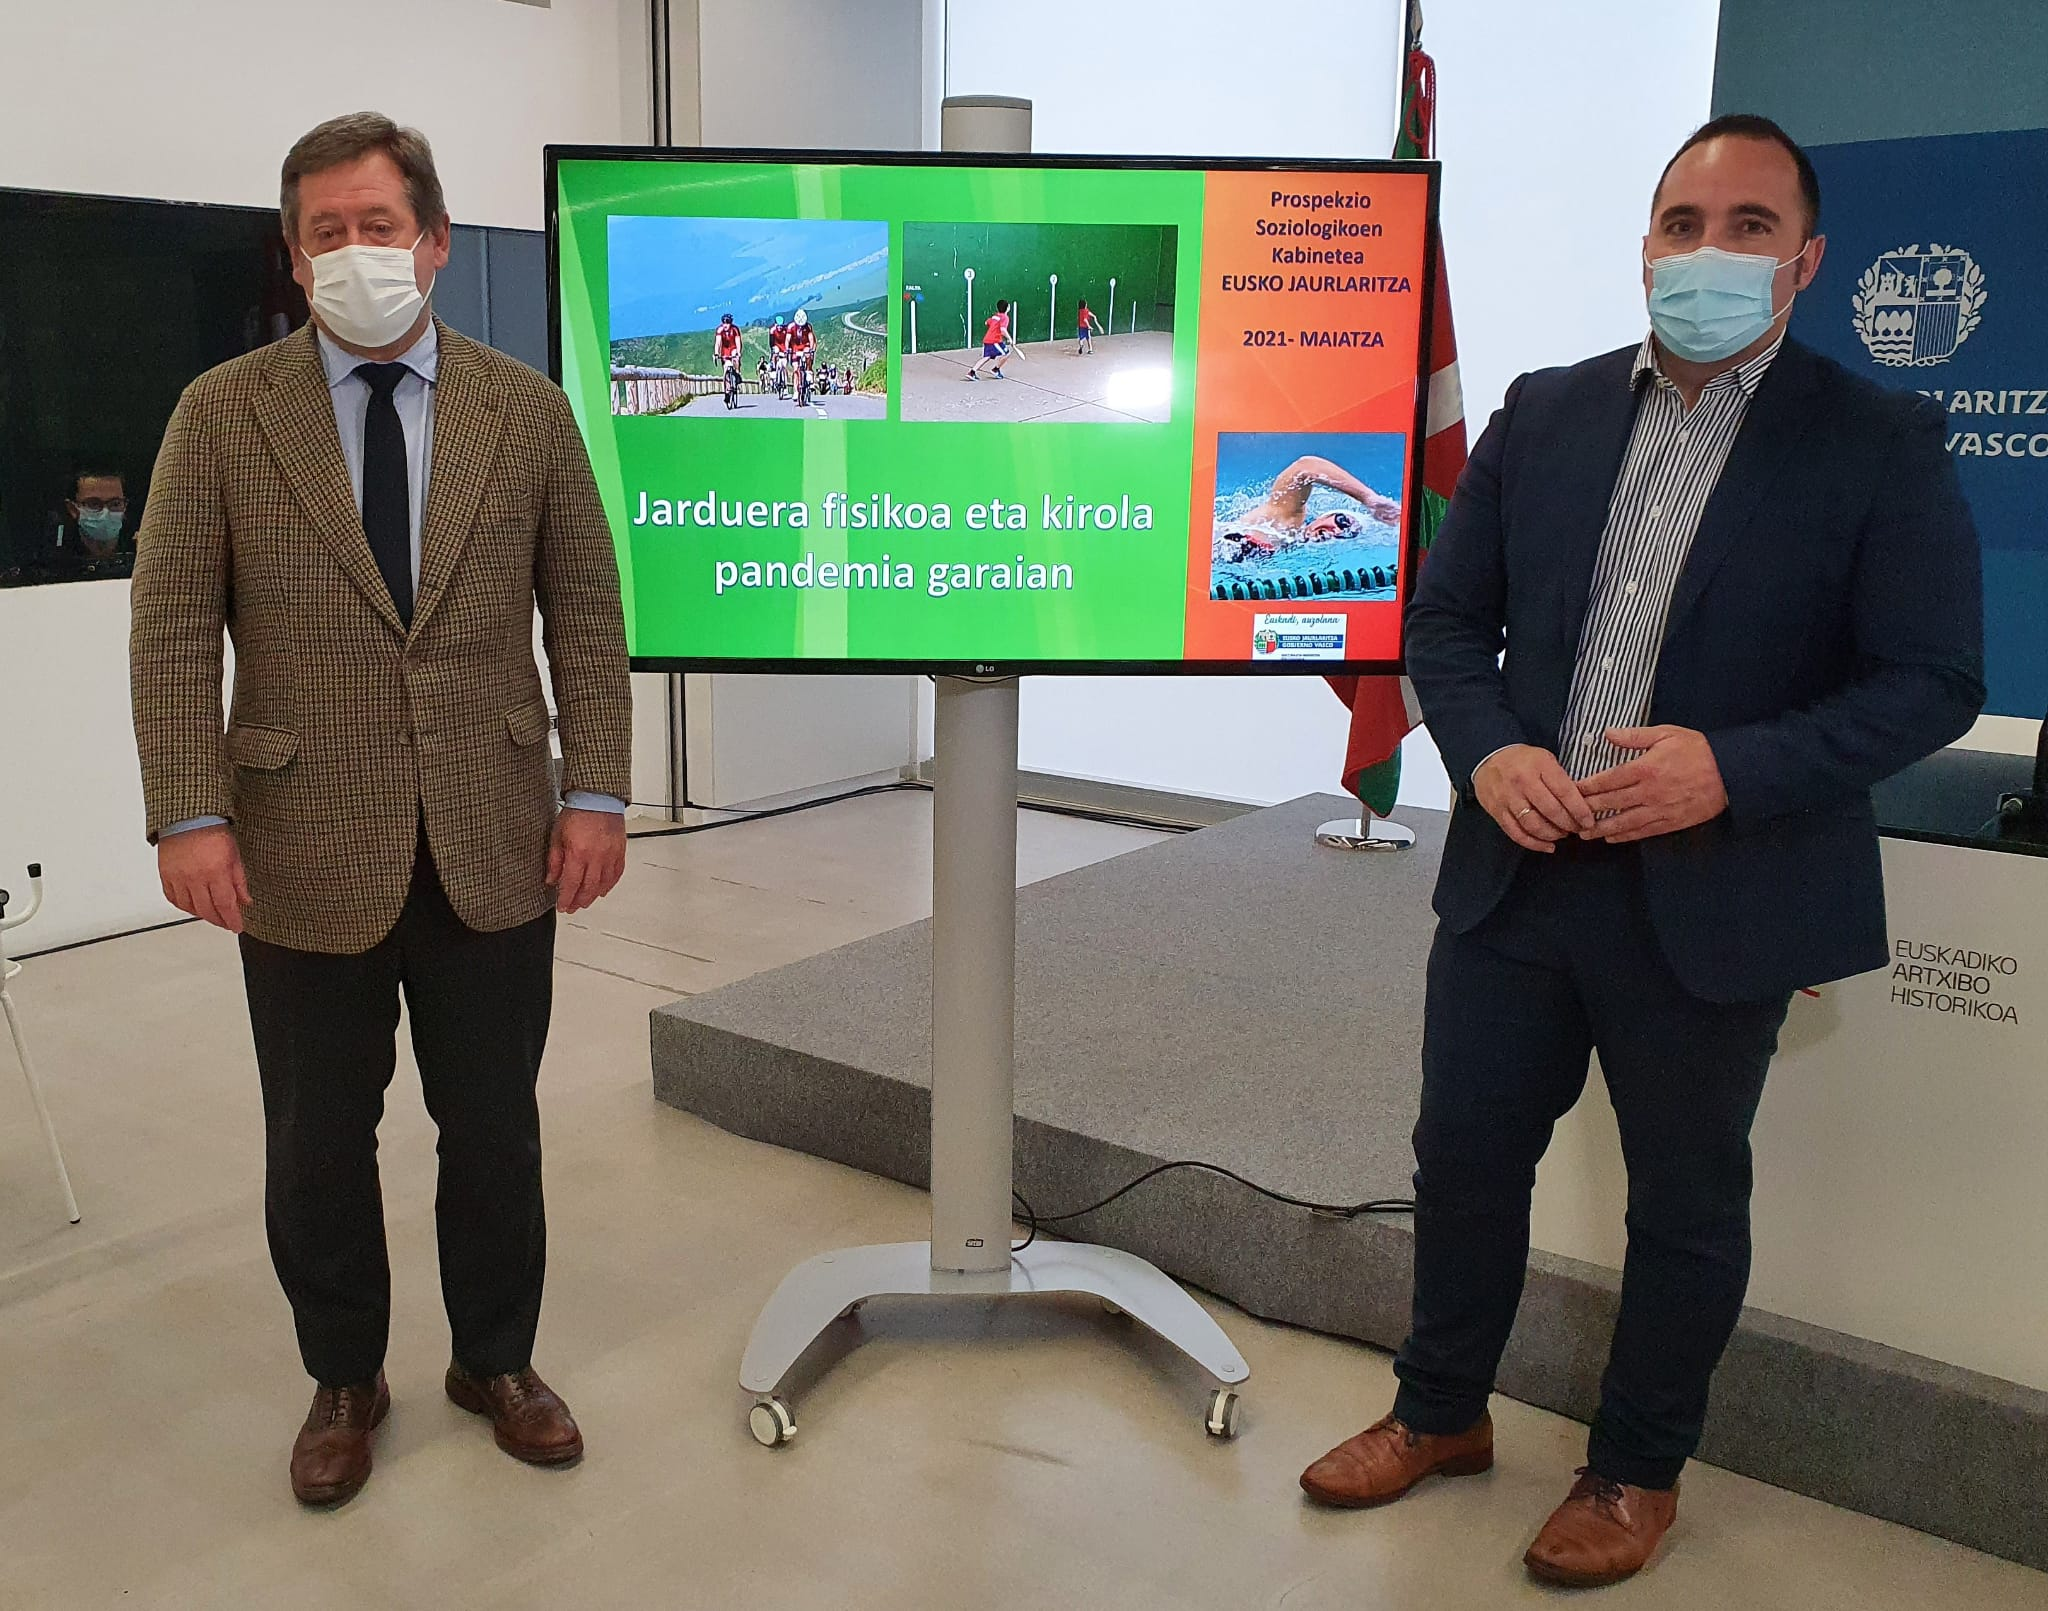 zupiria_kirola_pandemian.jpg